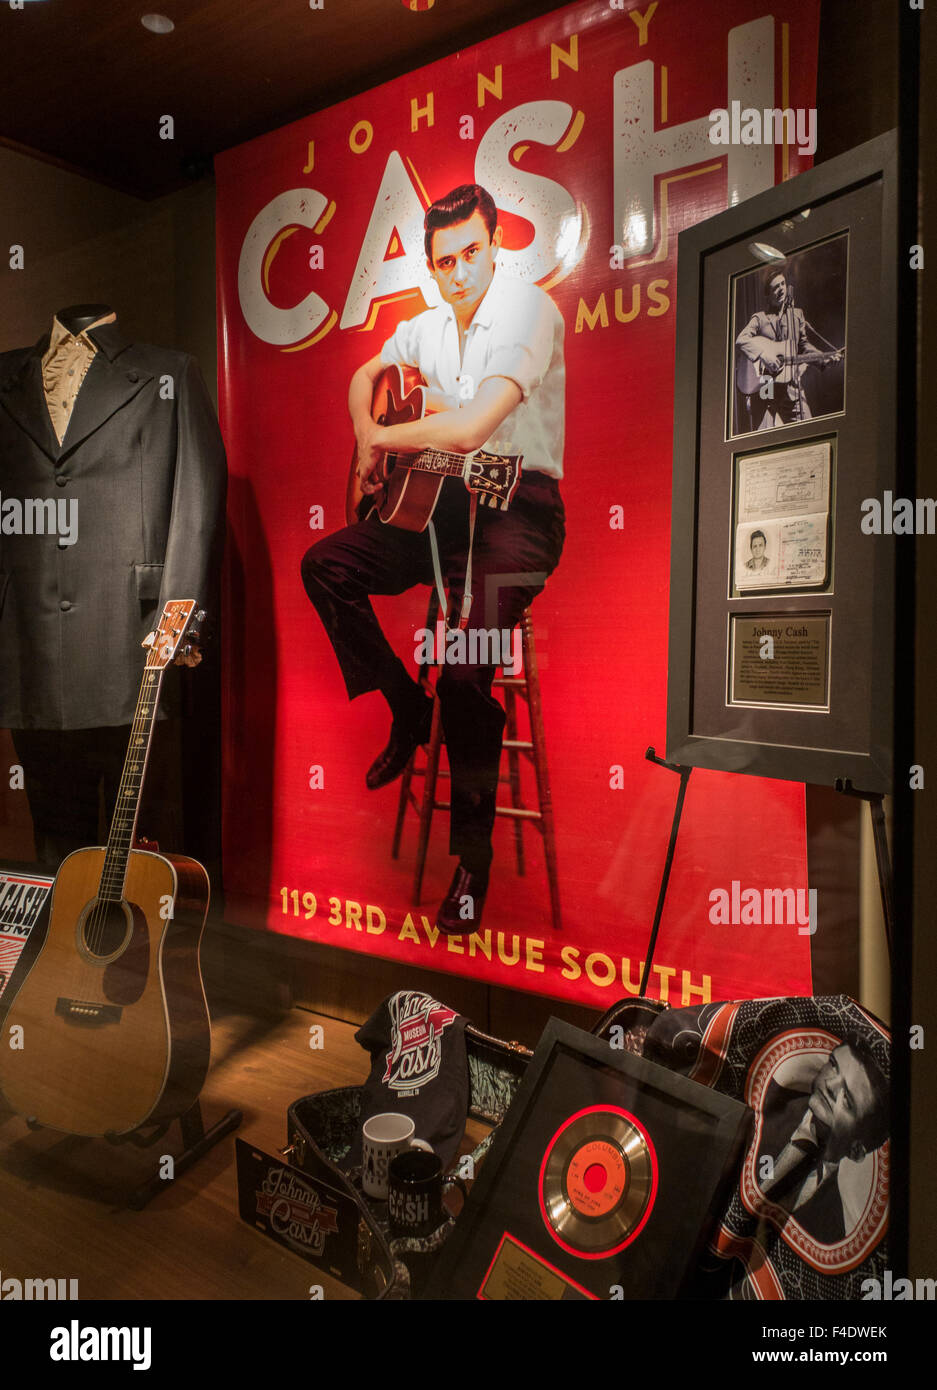 Museo de Johnny Cash en Nashville, Tennessee Imagen De Stock